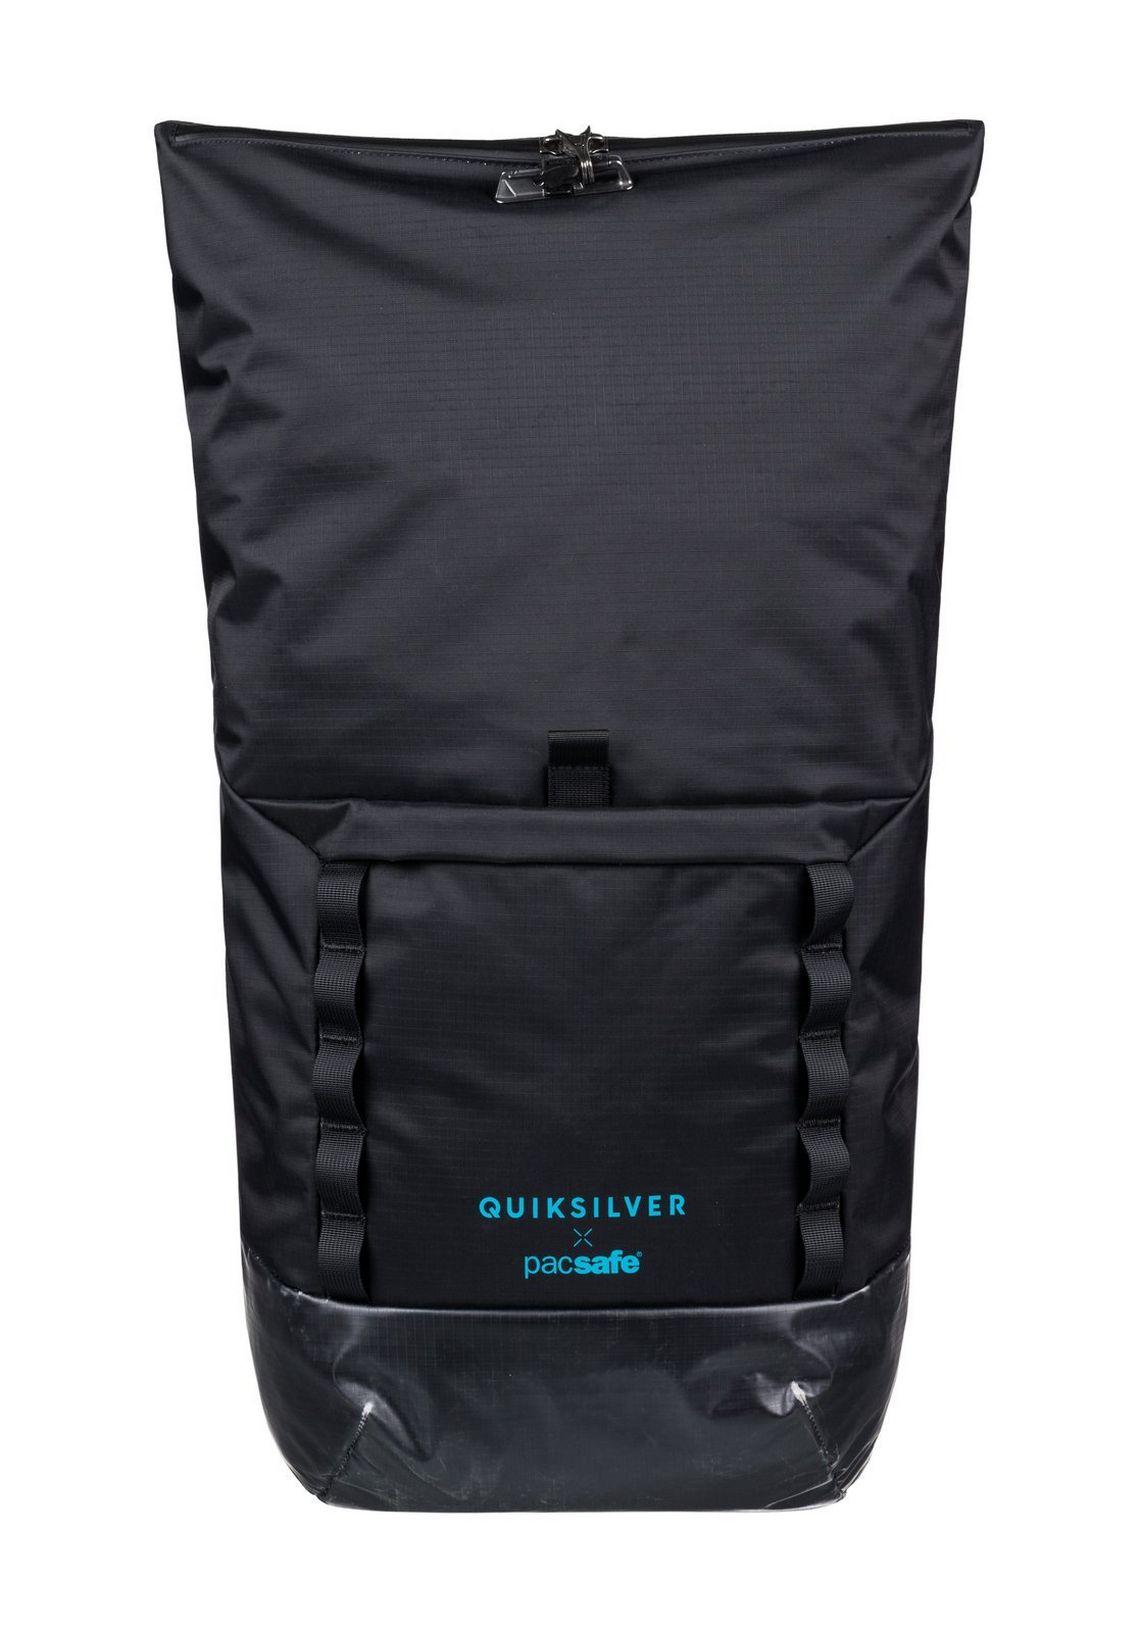 Quiksilver - Pacsafe X QS 30L - Large Antidiefstal Wet/Dry Rugzak makkelijk besteld  zwart